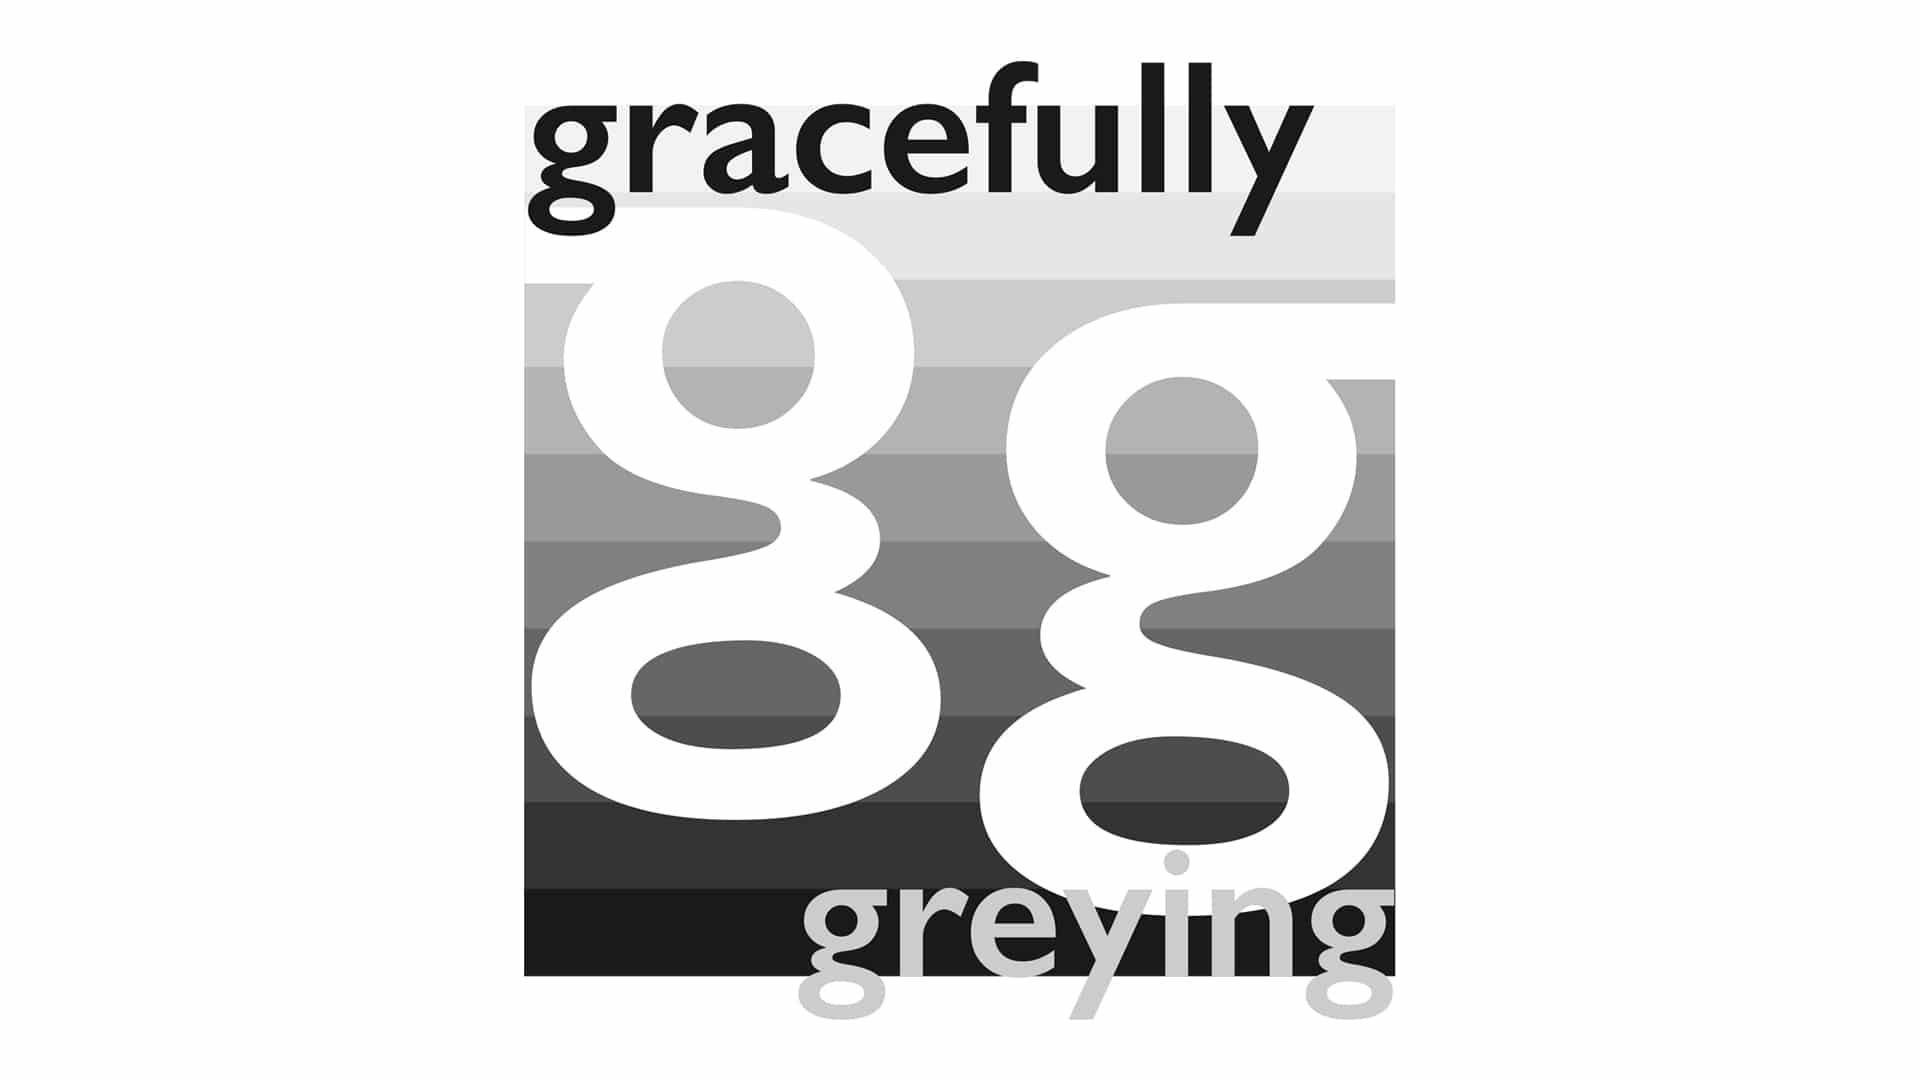 Gracefully Greying